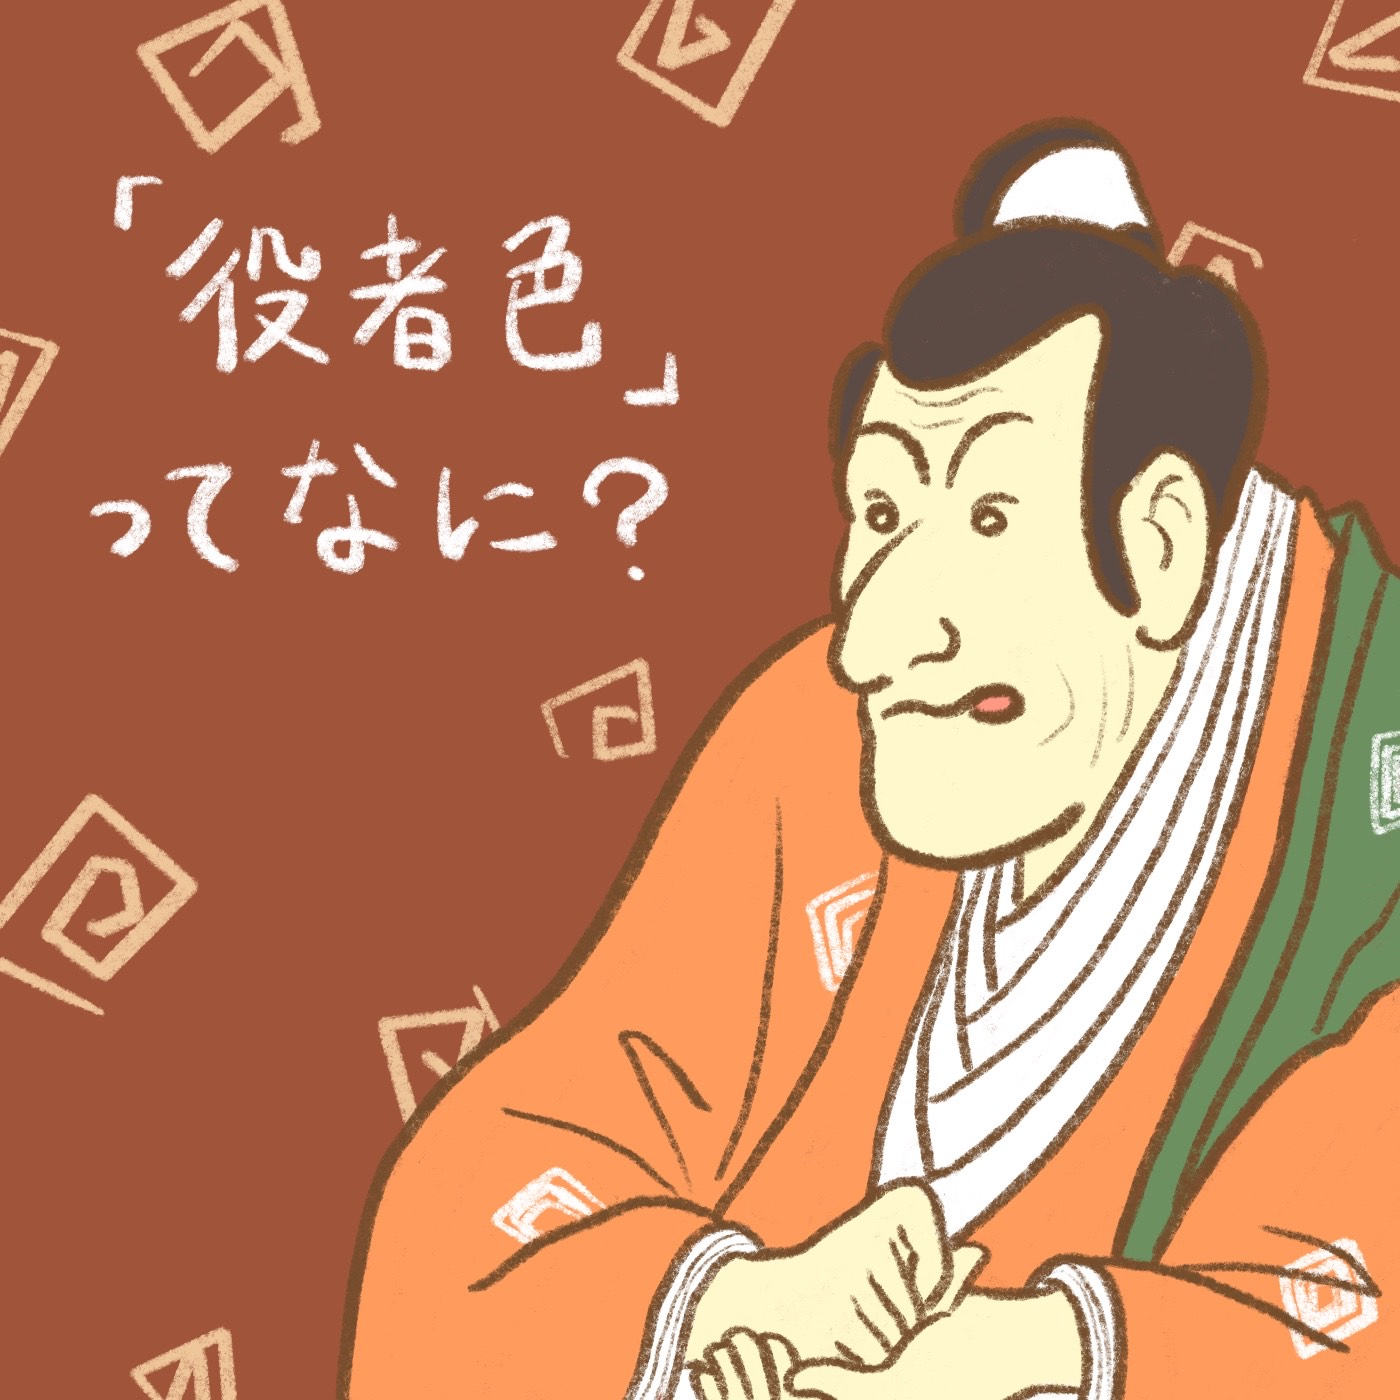 OBIKAKE ナニソレ 歌舞伎役者 江戸時代 浮世絵 つちやさや